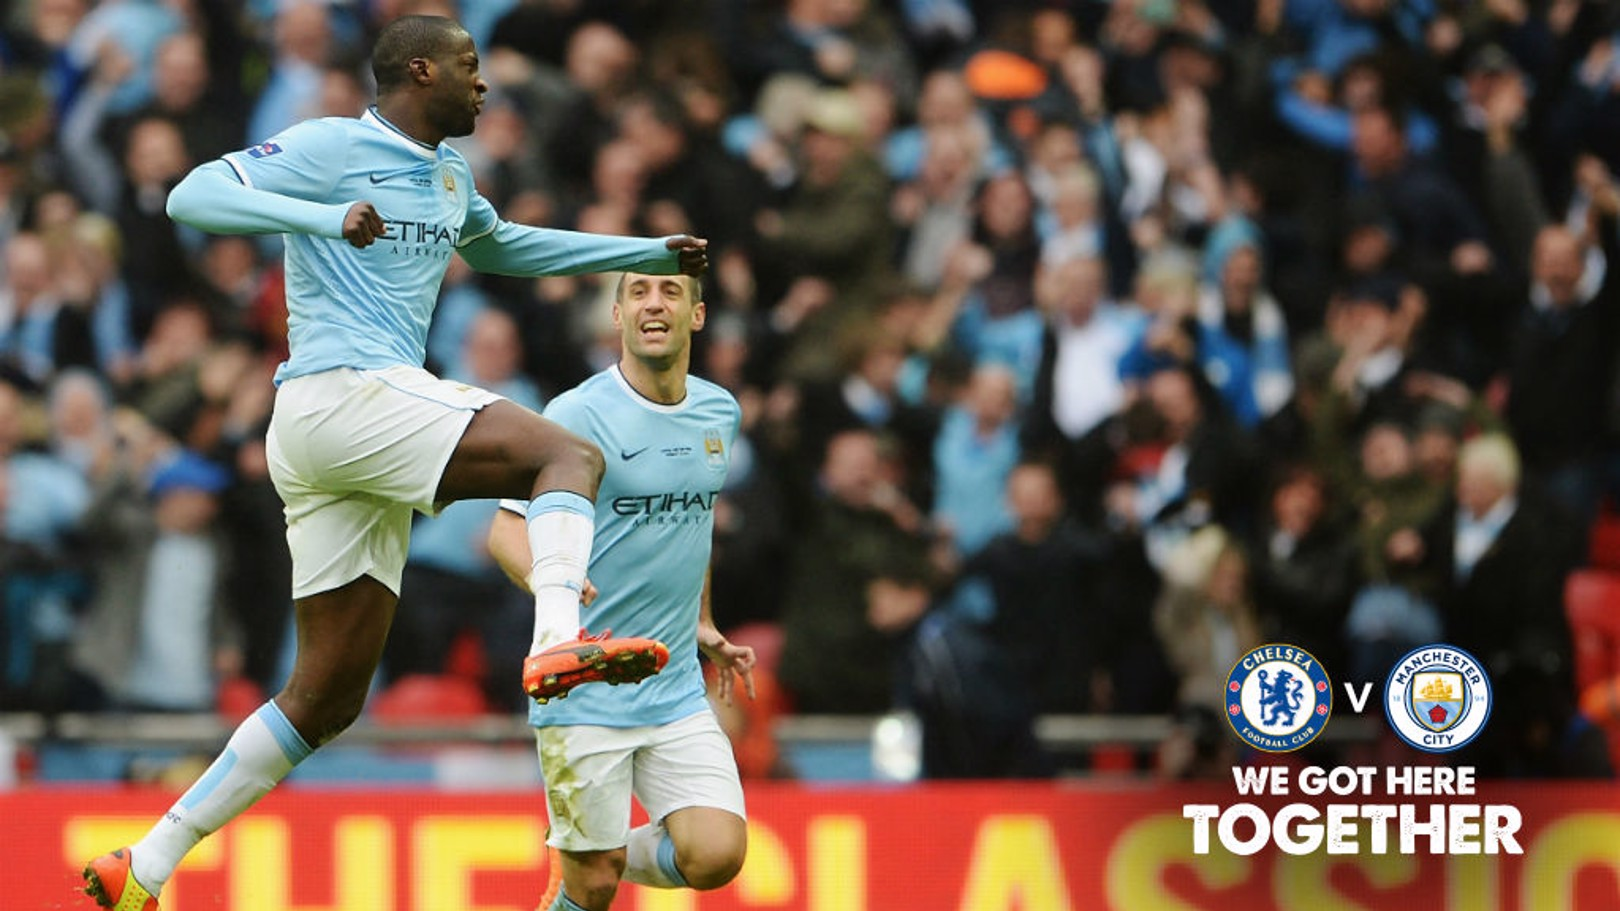 League Cup golden goals: Yaya Toure 2014